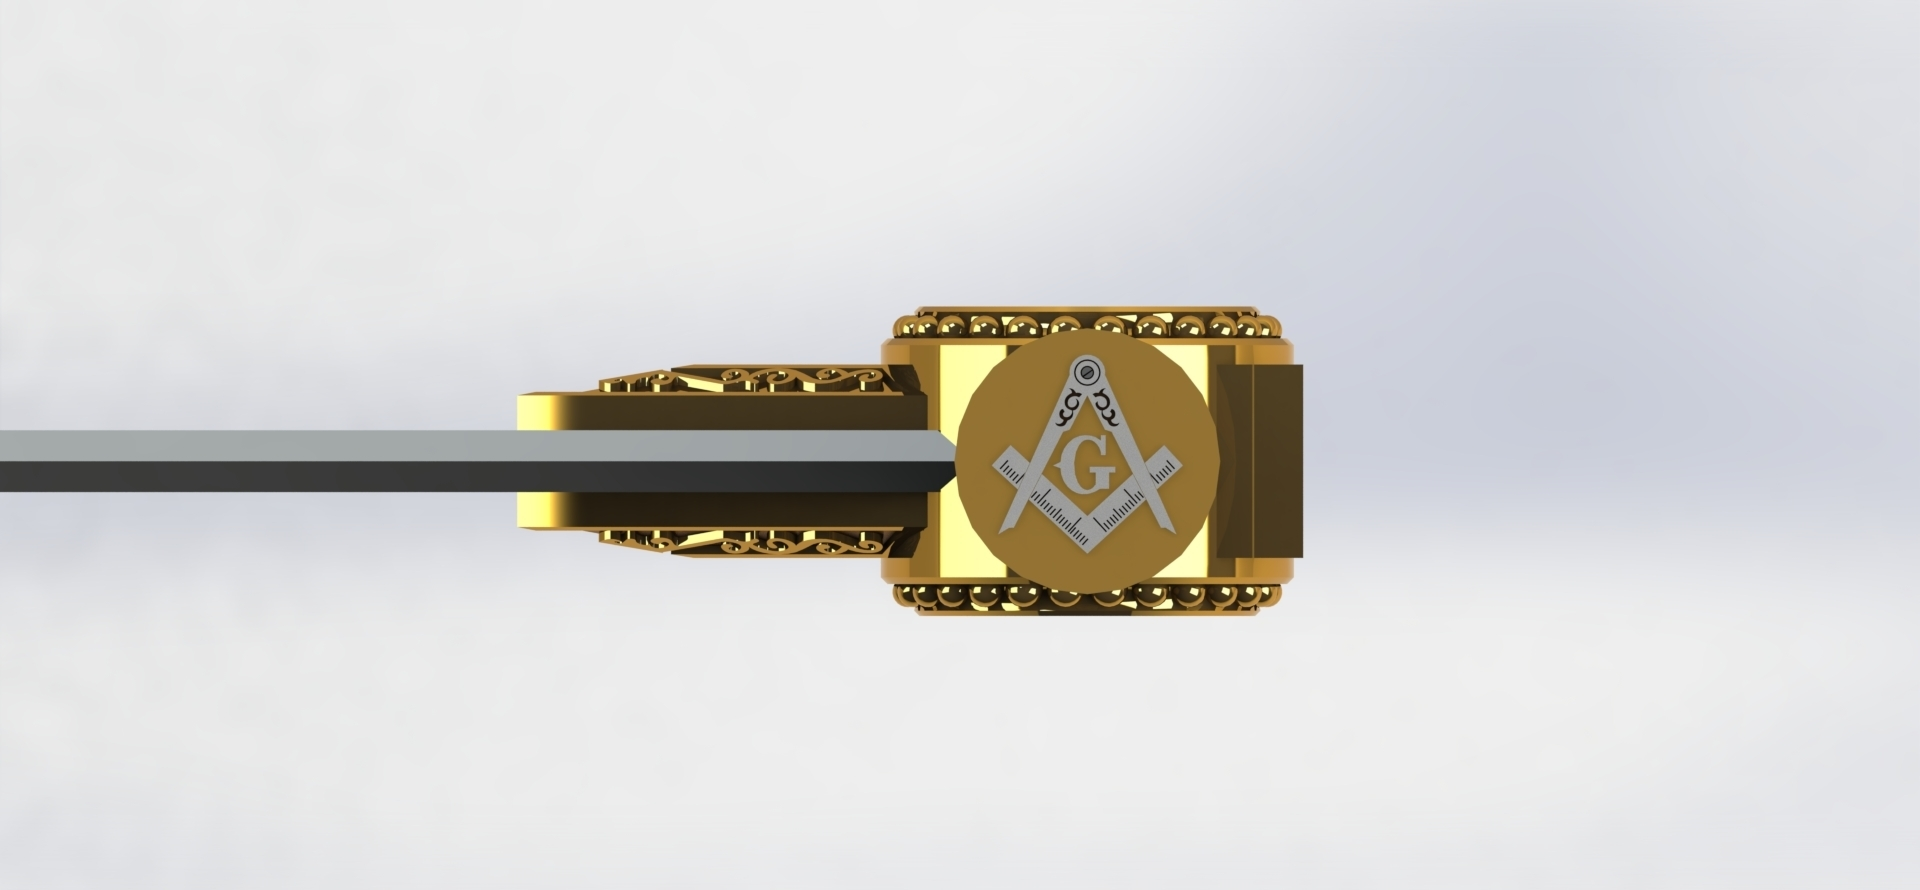 preview 8.JPG Download STL file Masonic Ceremony Sword-Ready 3D Print • 3D printable template, GokBoru